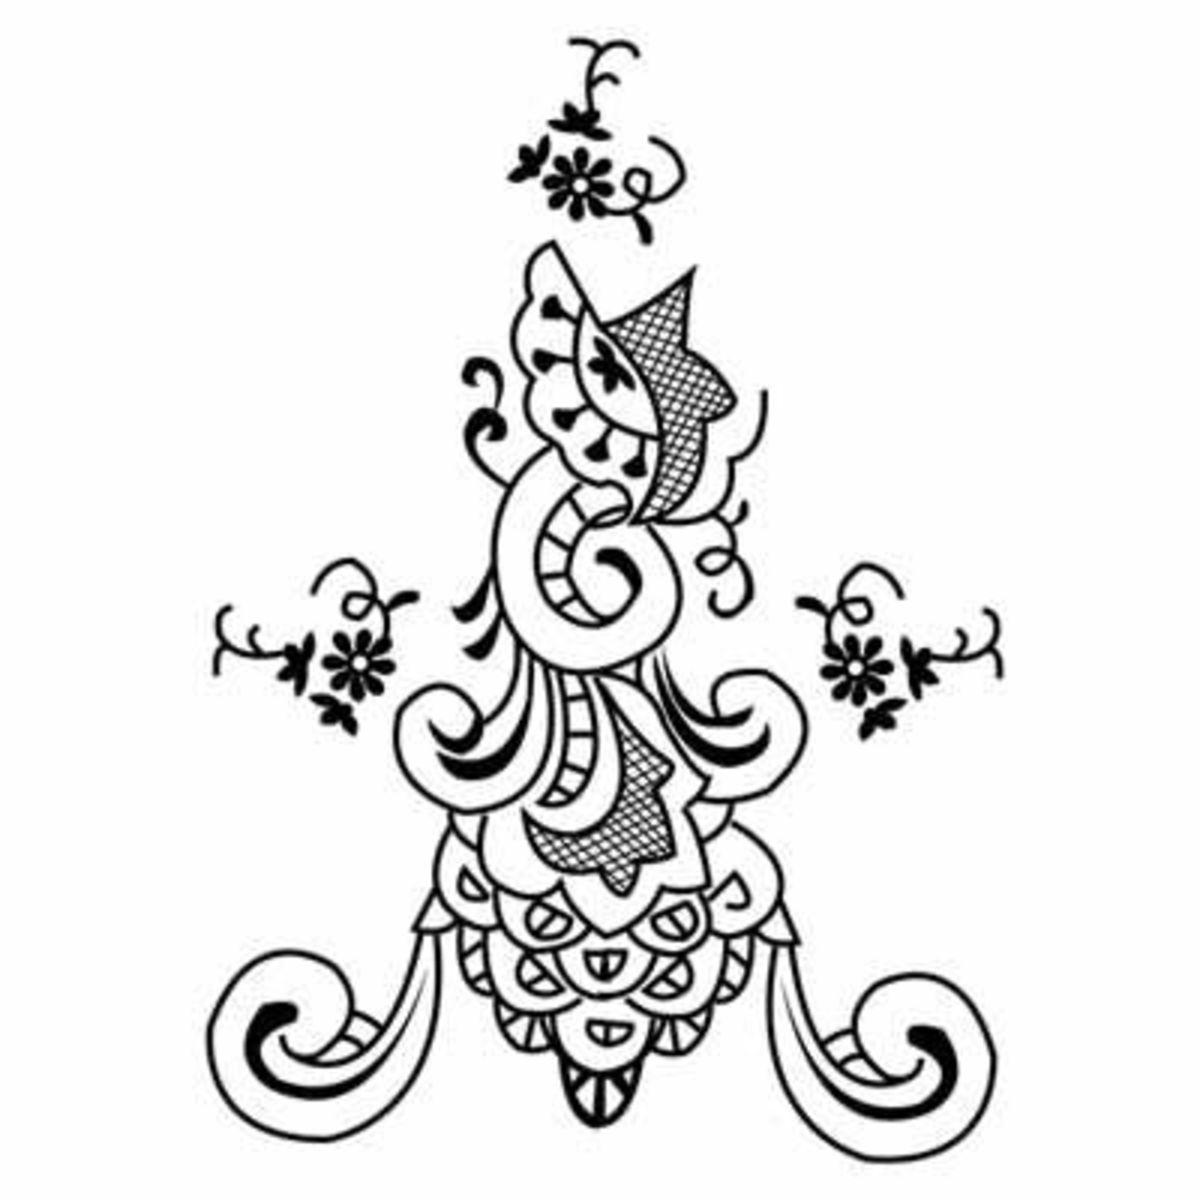 Doodle design printable stencil.Source: Fashion Frog